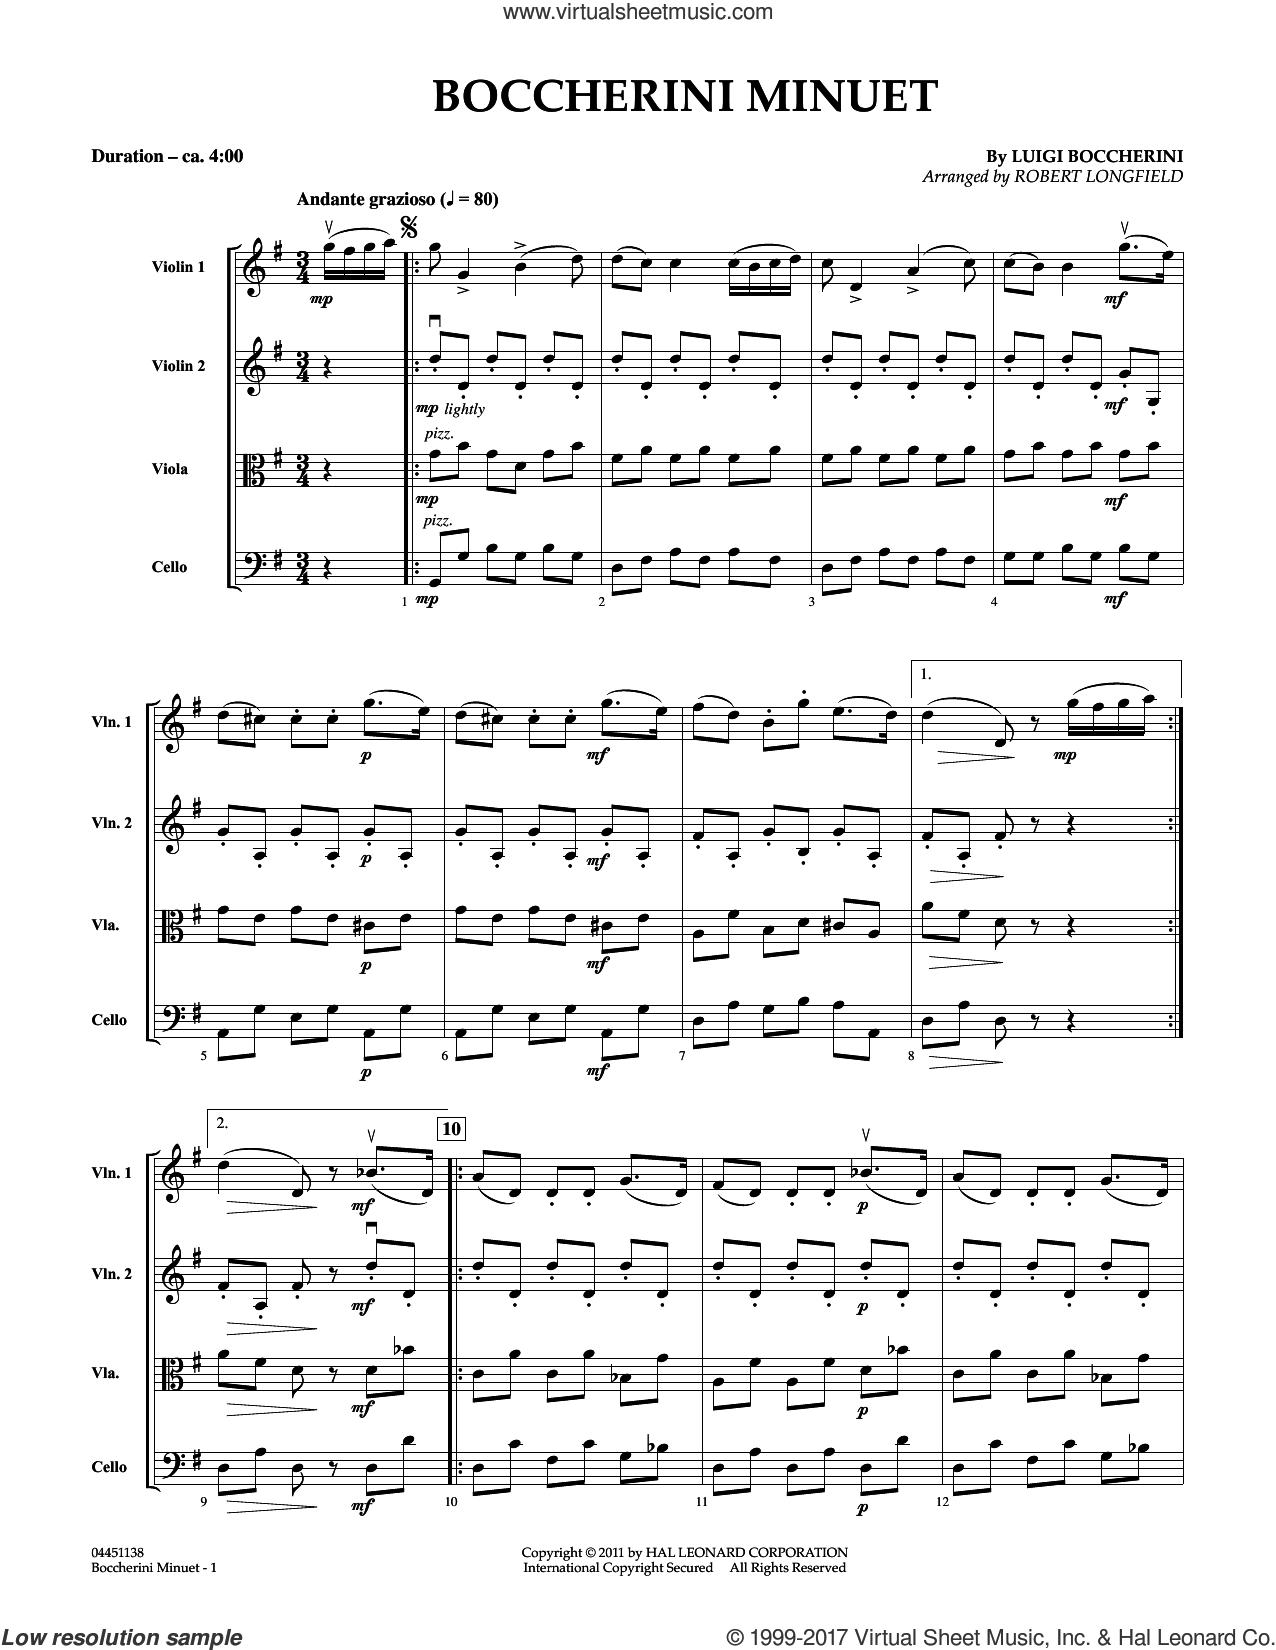 Boccherini Minuet (COMPLETE) sheet music for string quartet (Strings) by Robert Longfield and Luigi Boccherini, classical score, intermediate orchestra